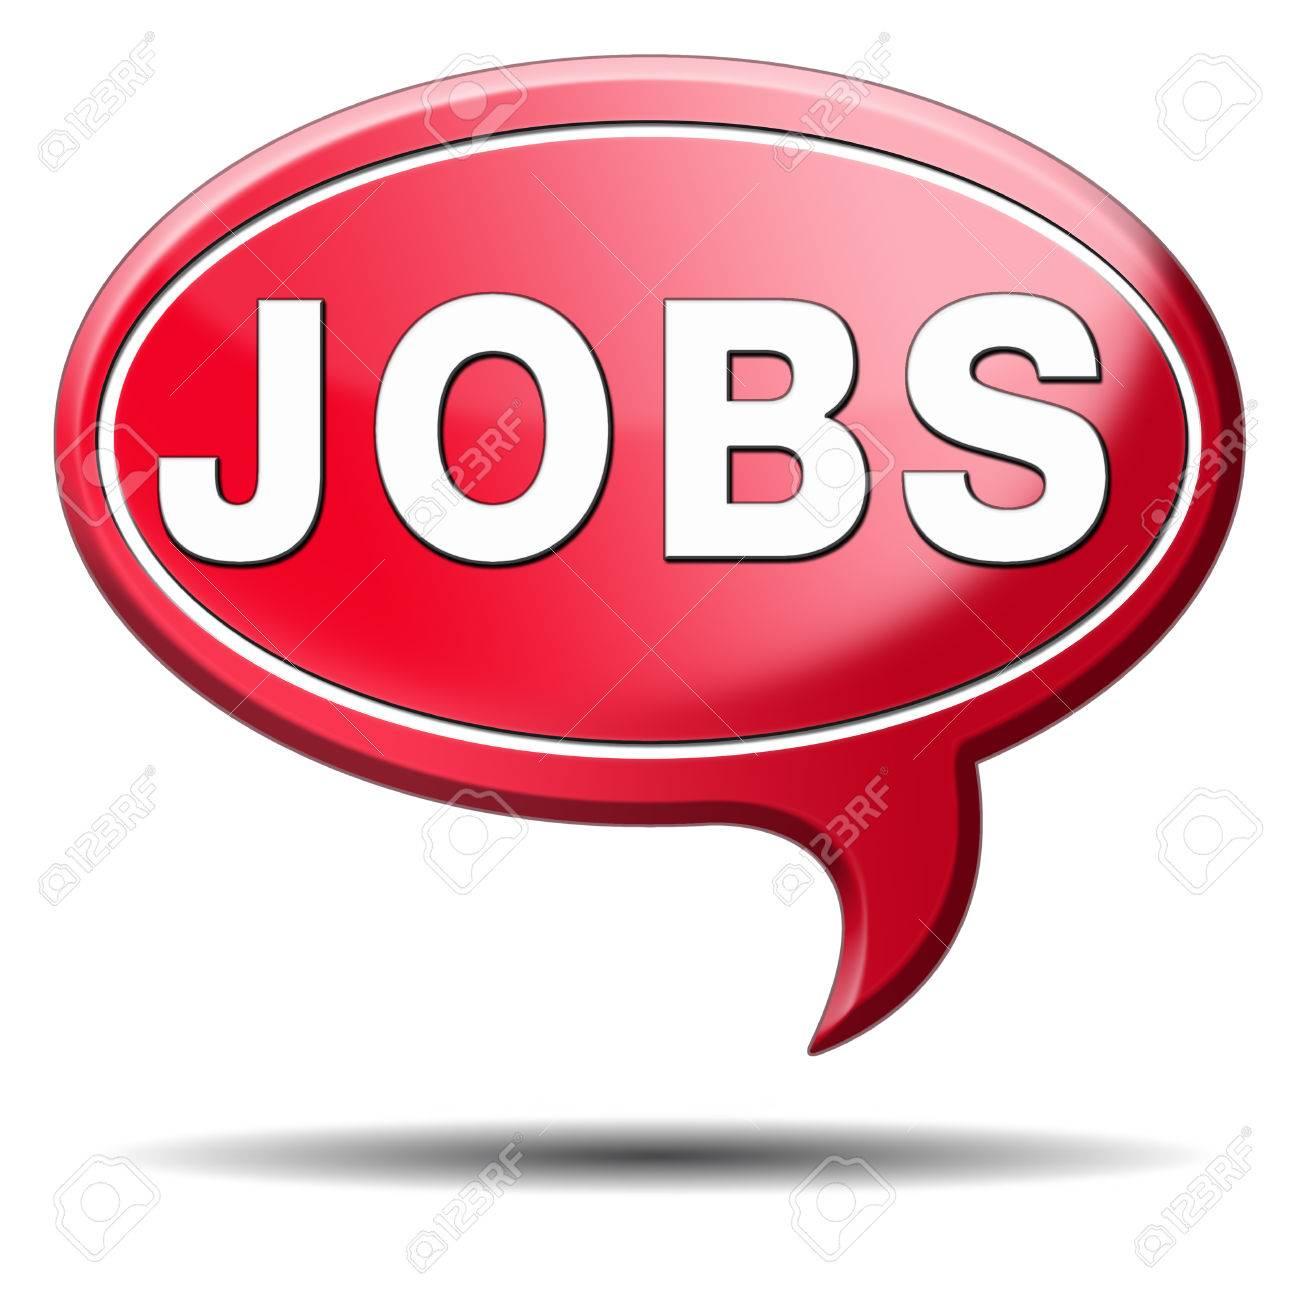 job application help